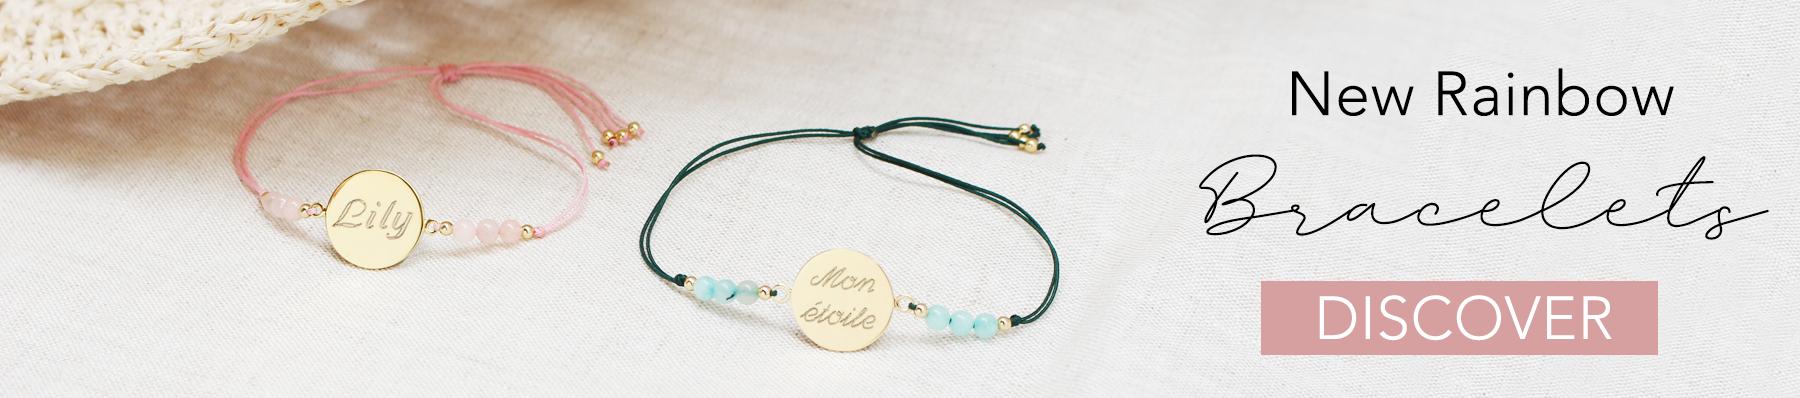 New rainbow bracelets